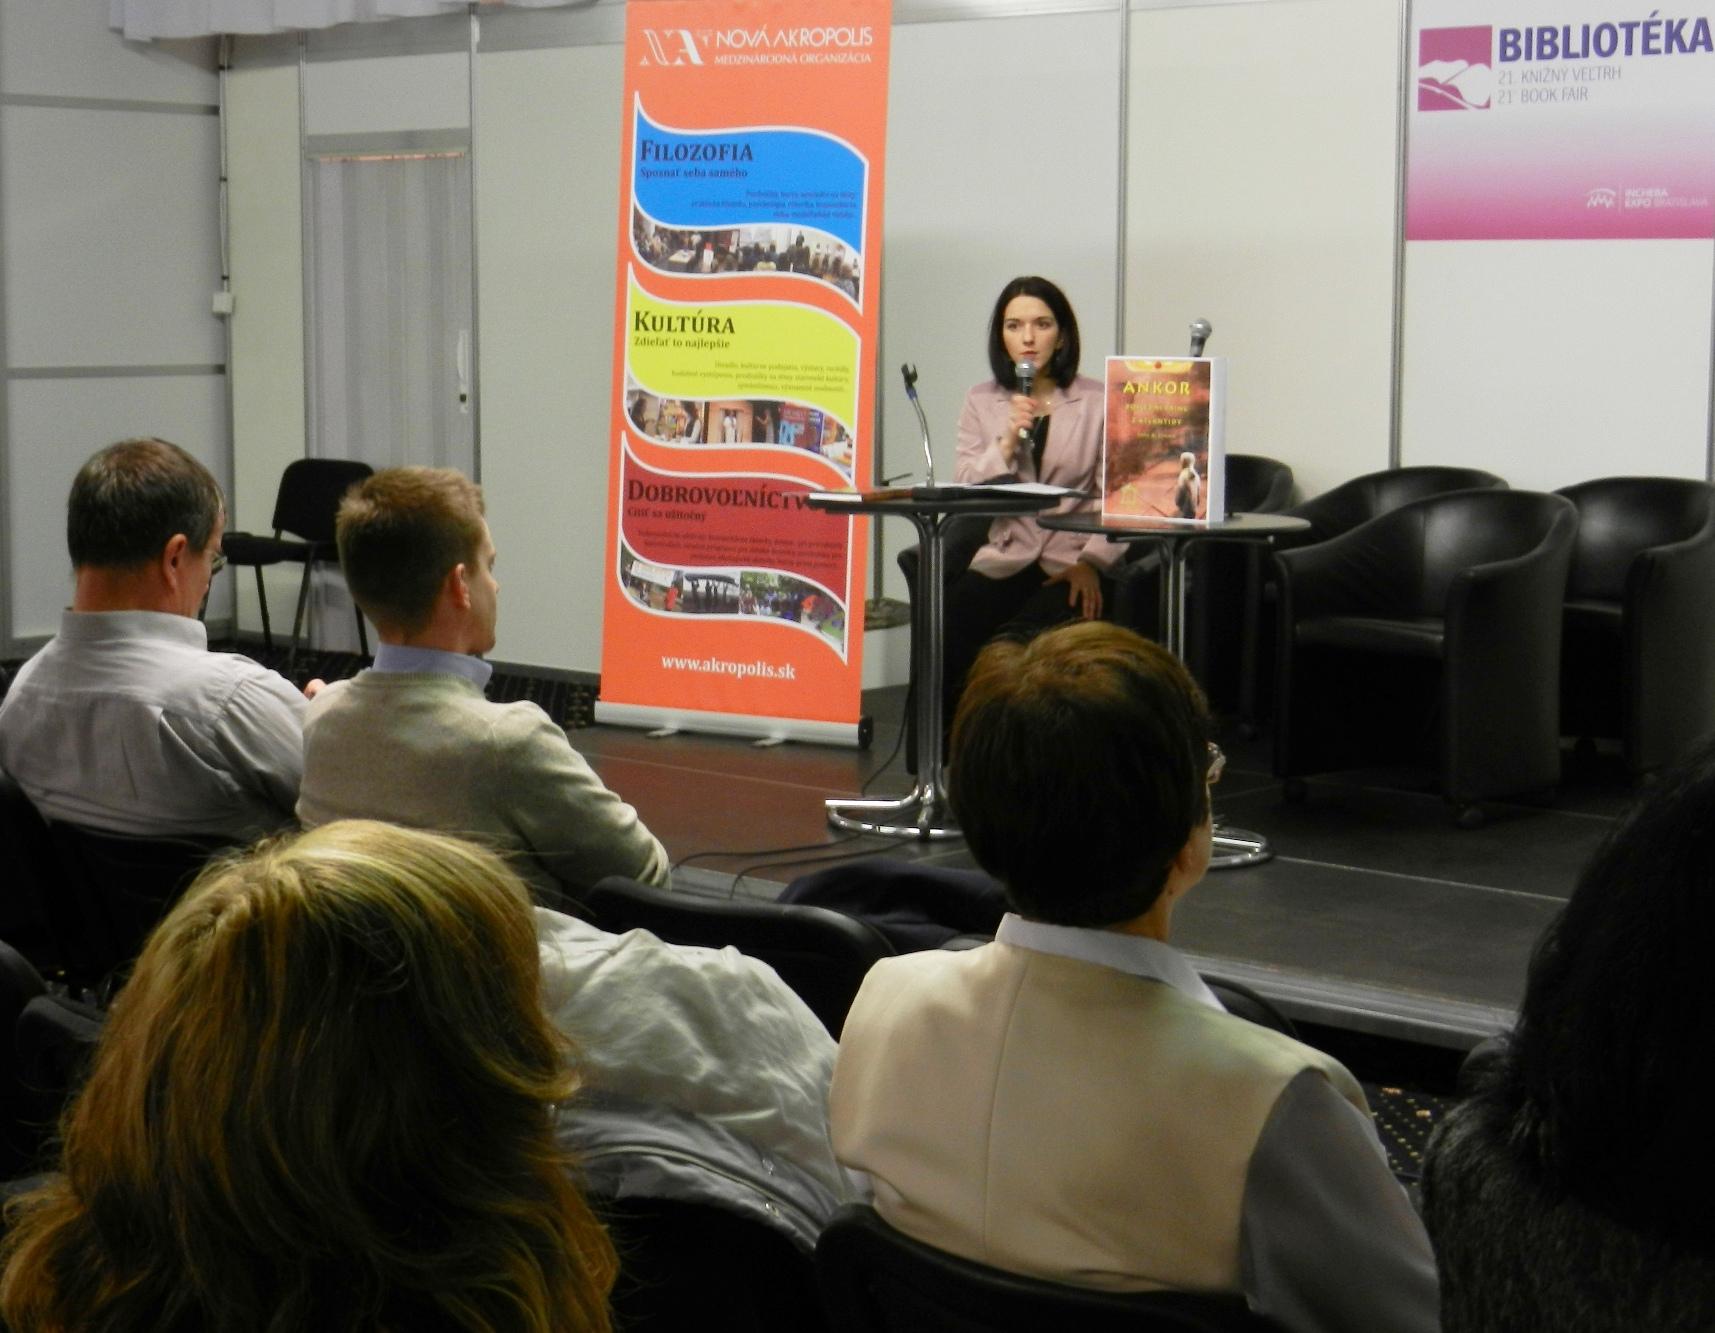 Nueva Acrópolis Eslovaquia: Feria del libro